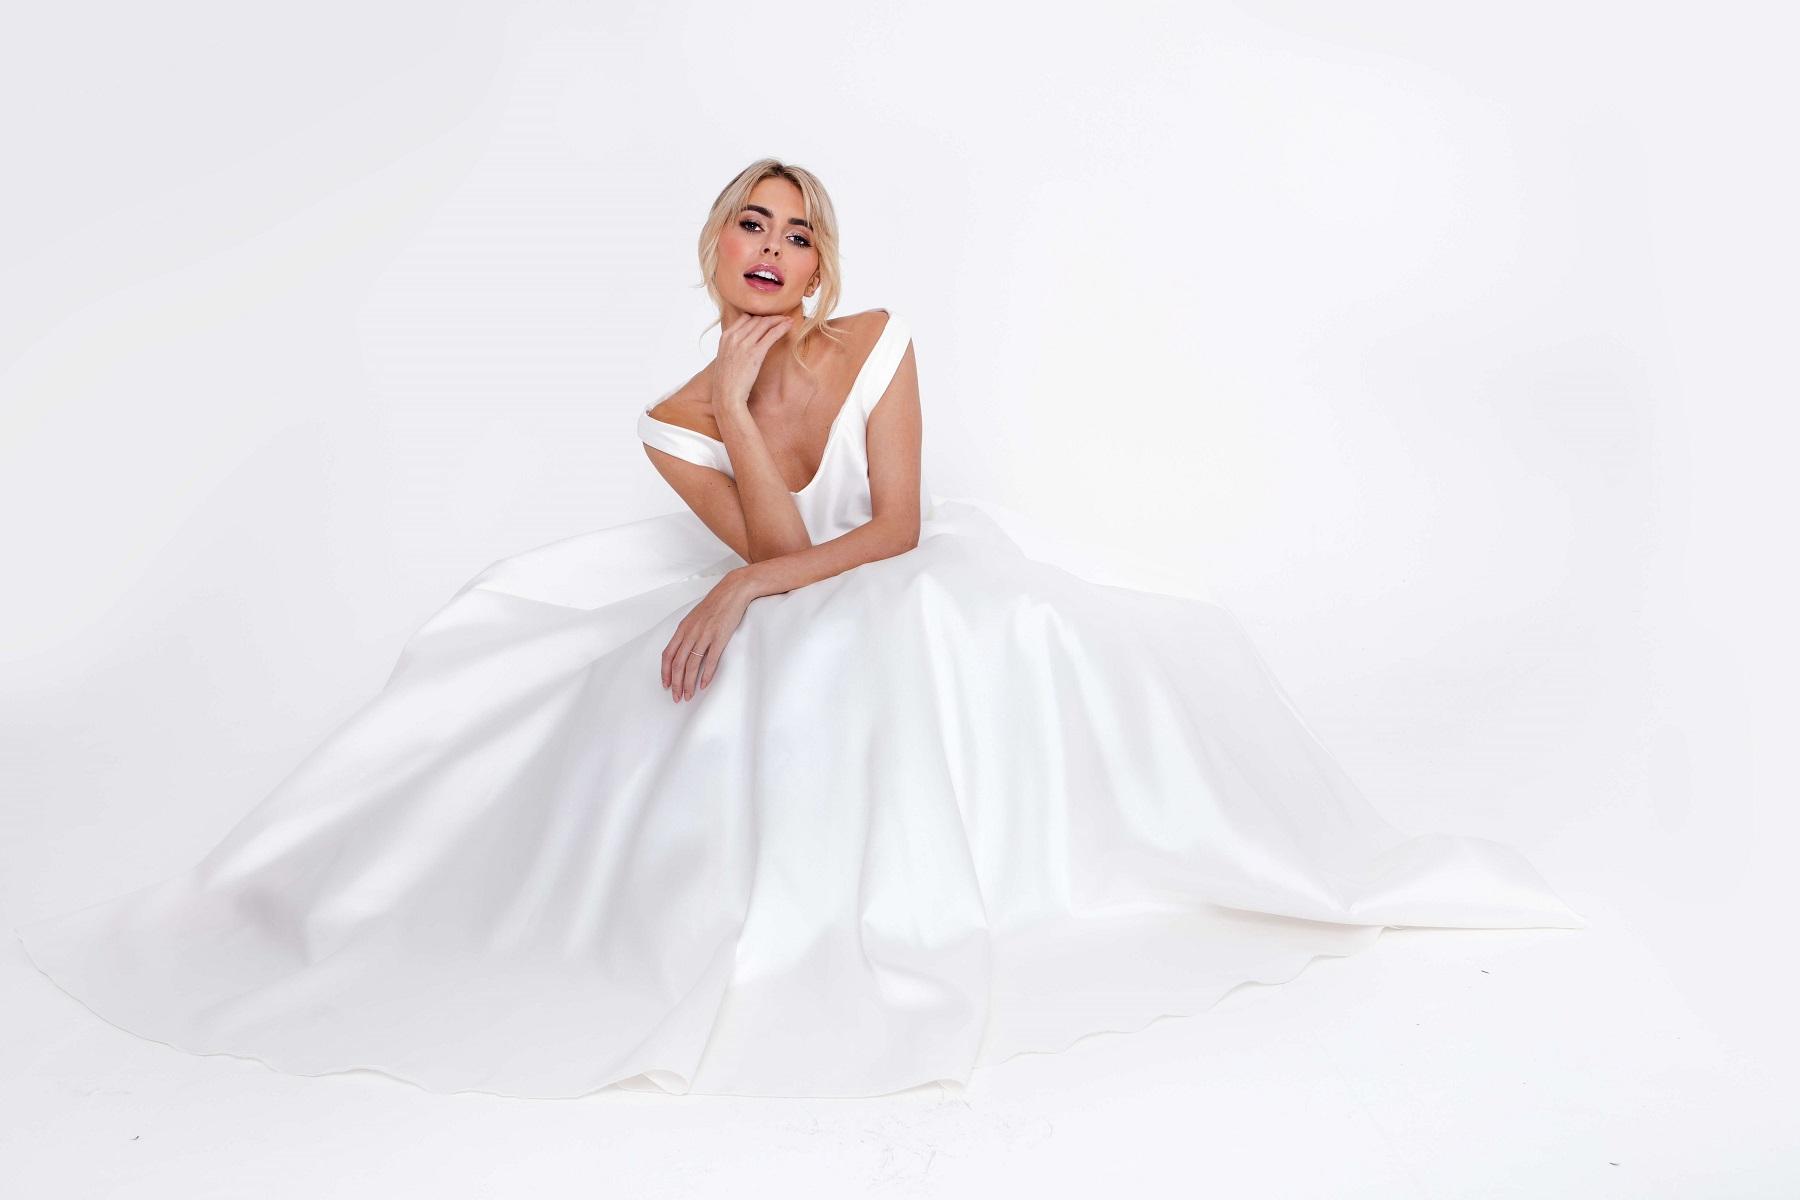 Caring Fairytale Bride